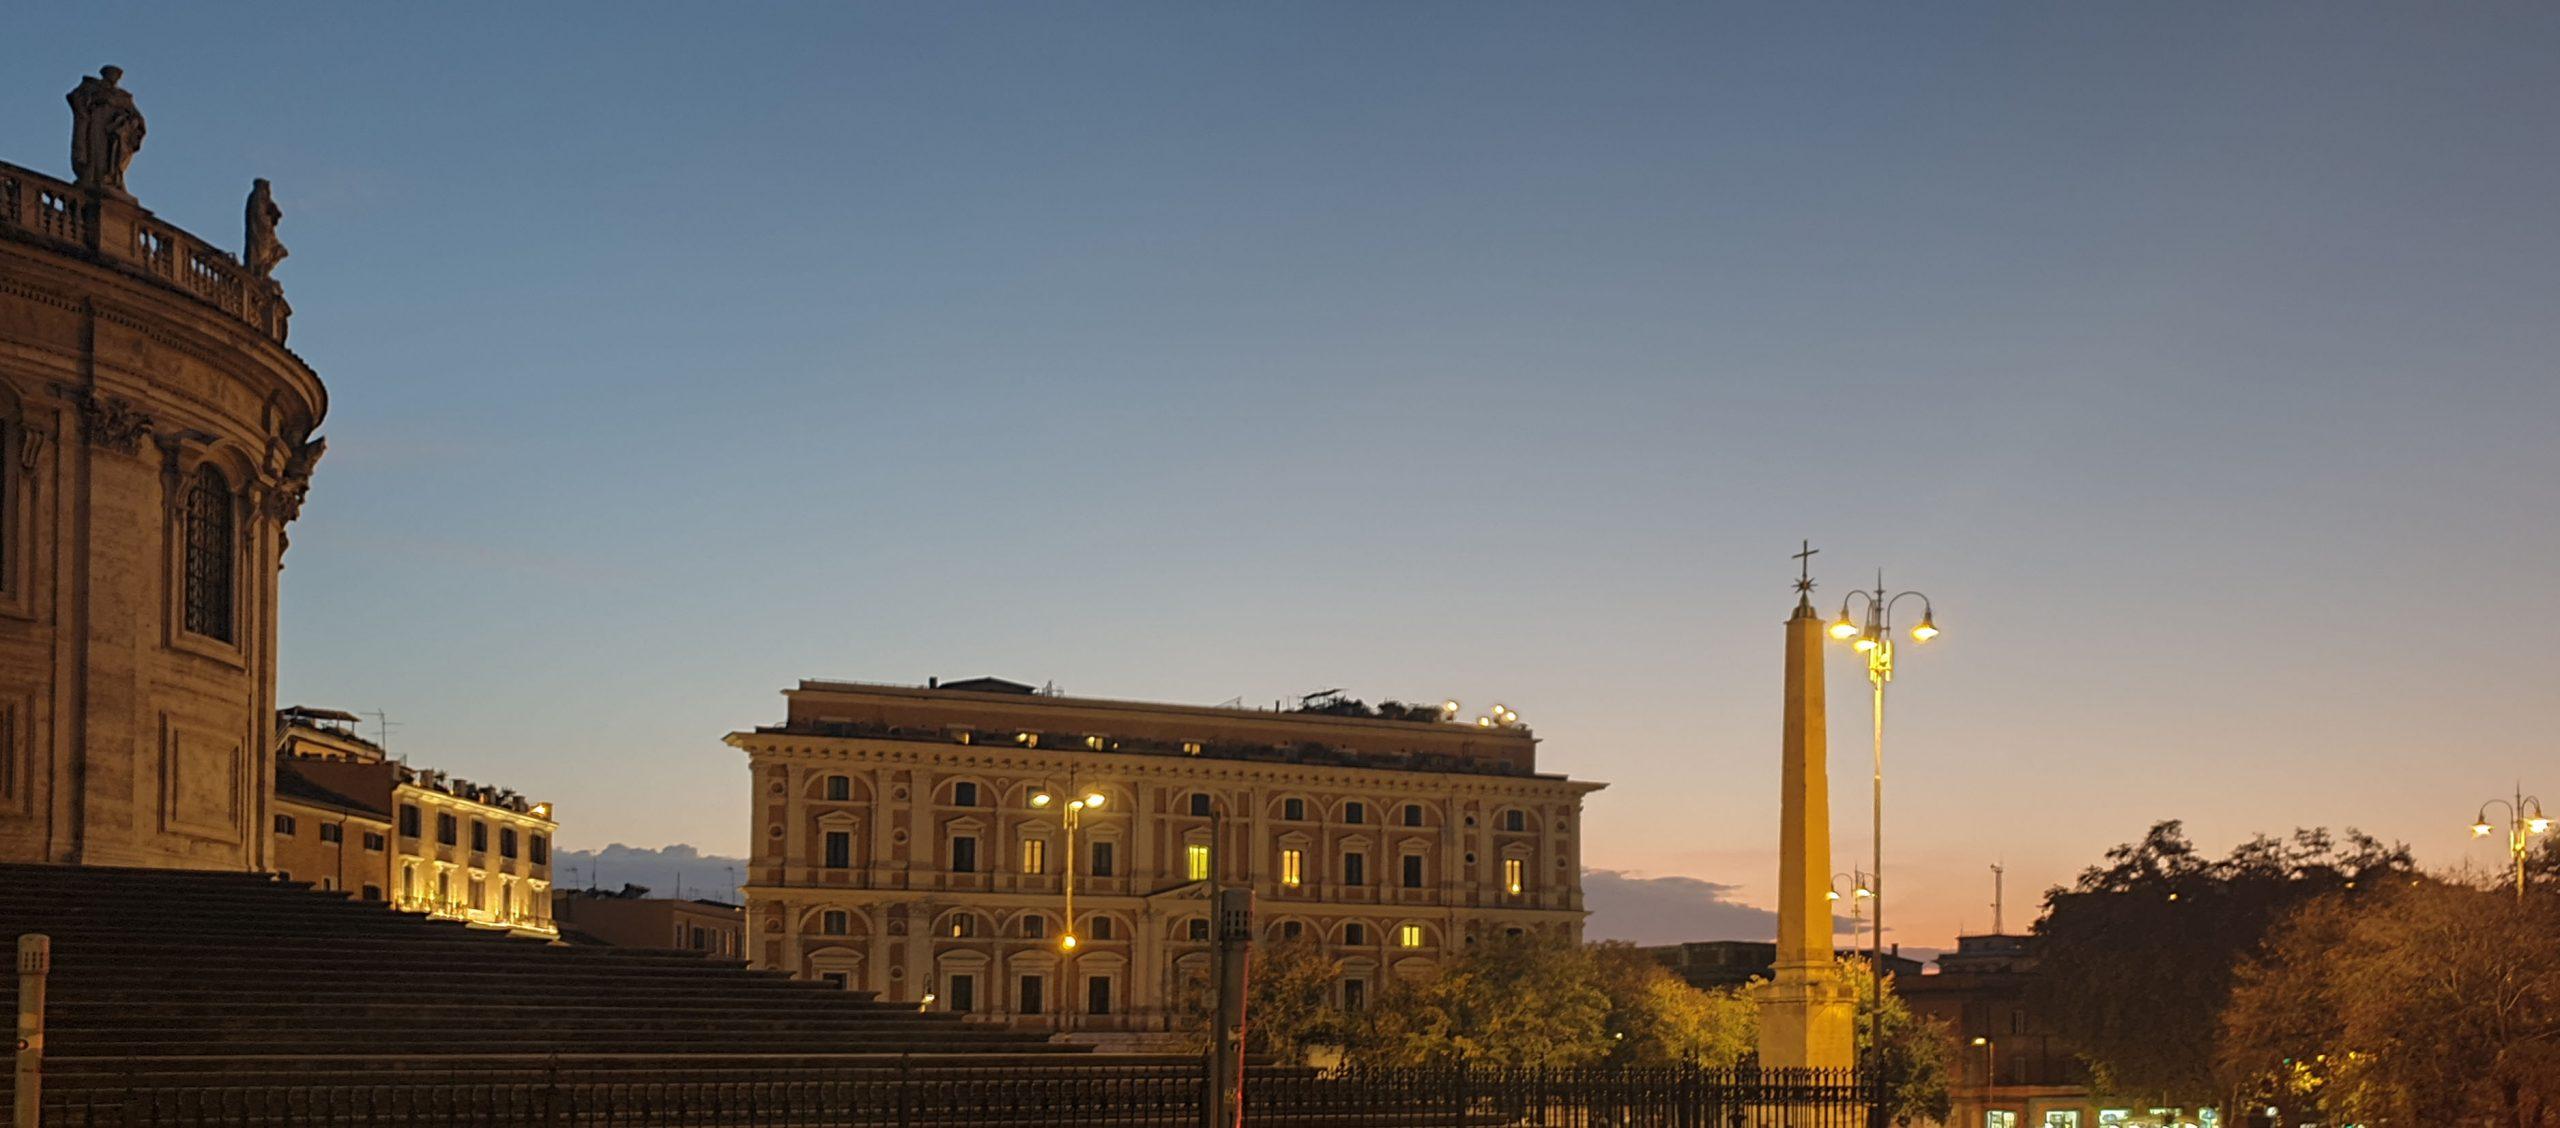 Esquiline Obelisk (Santa Maria Maggiore)